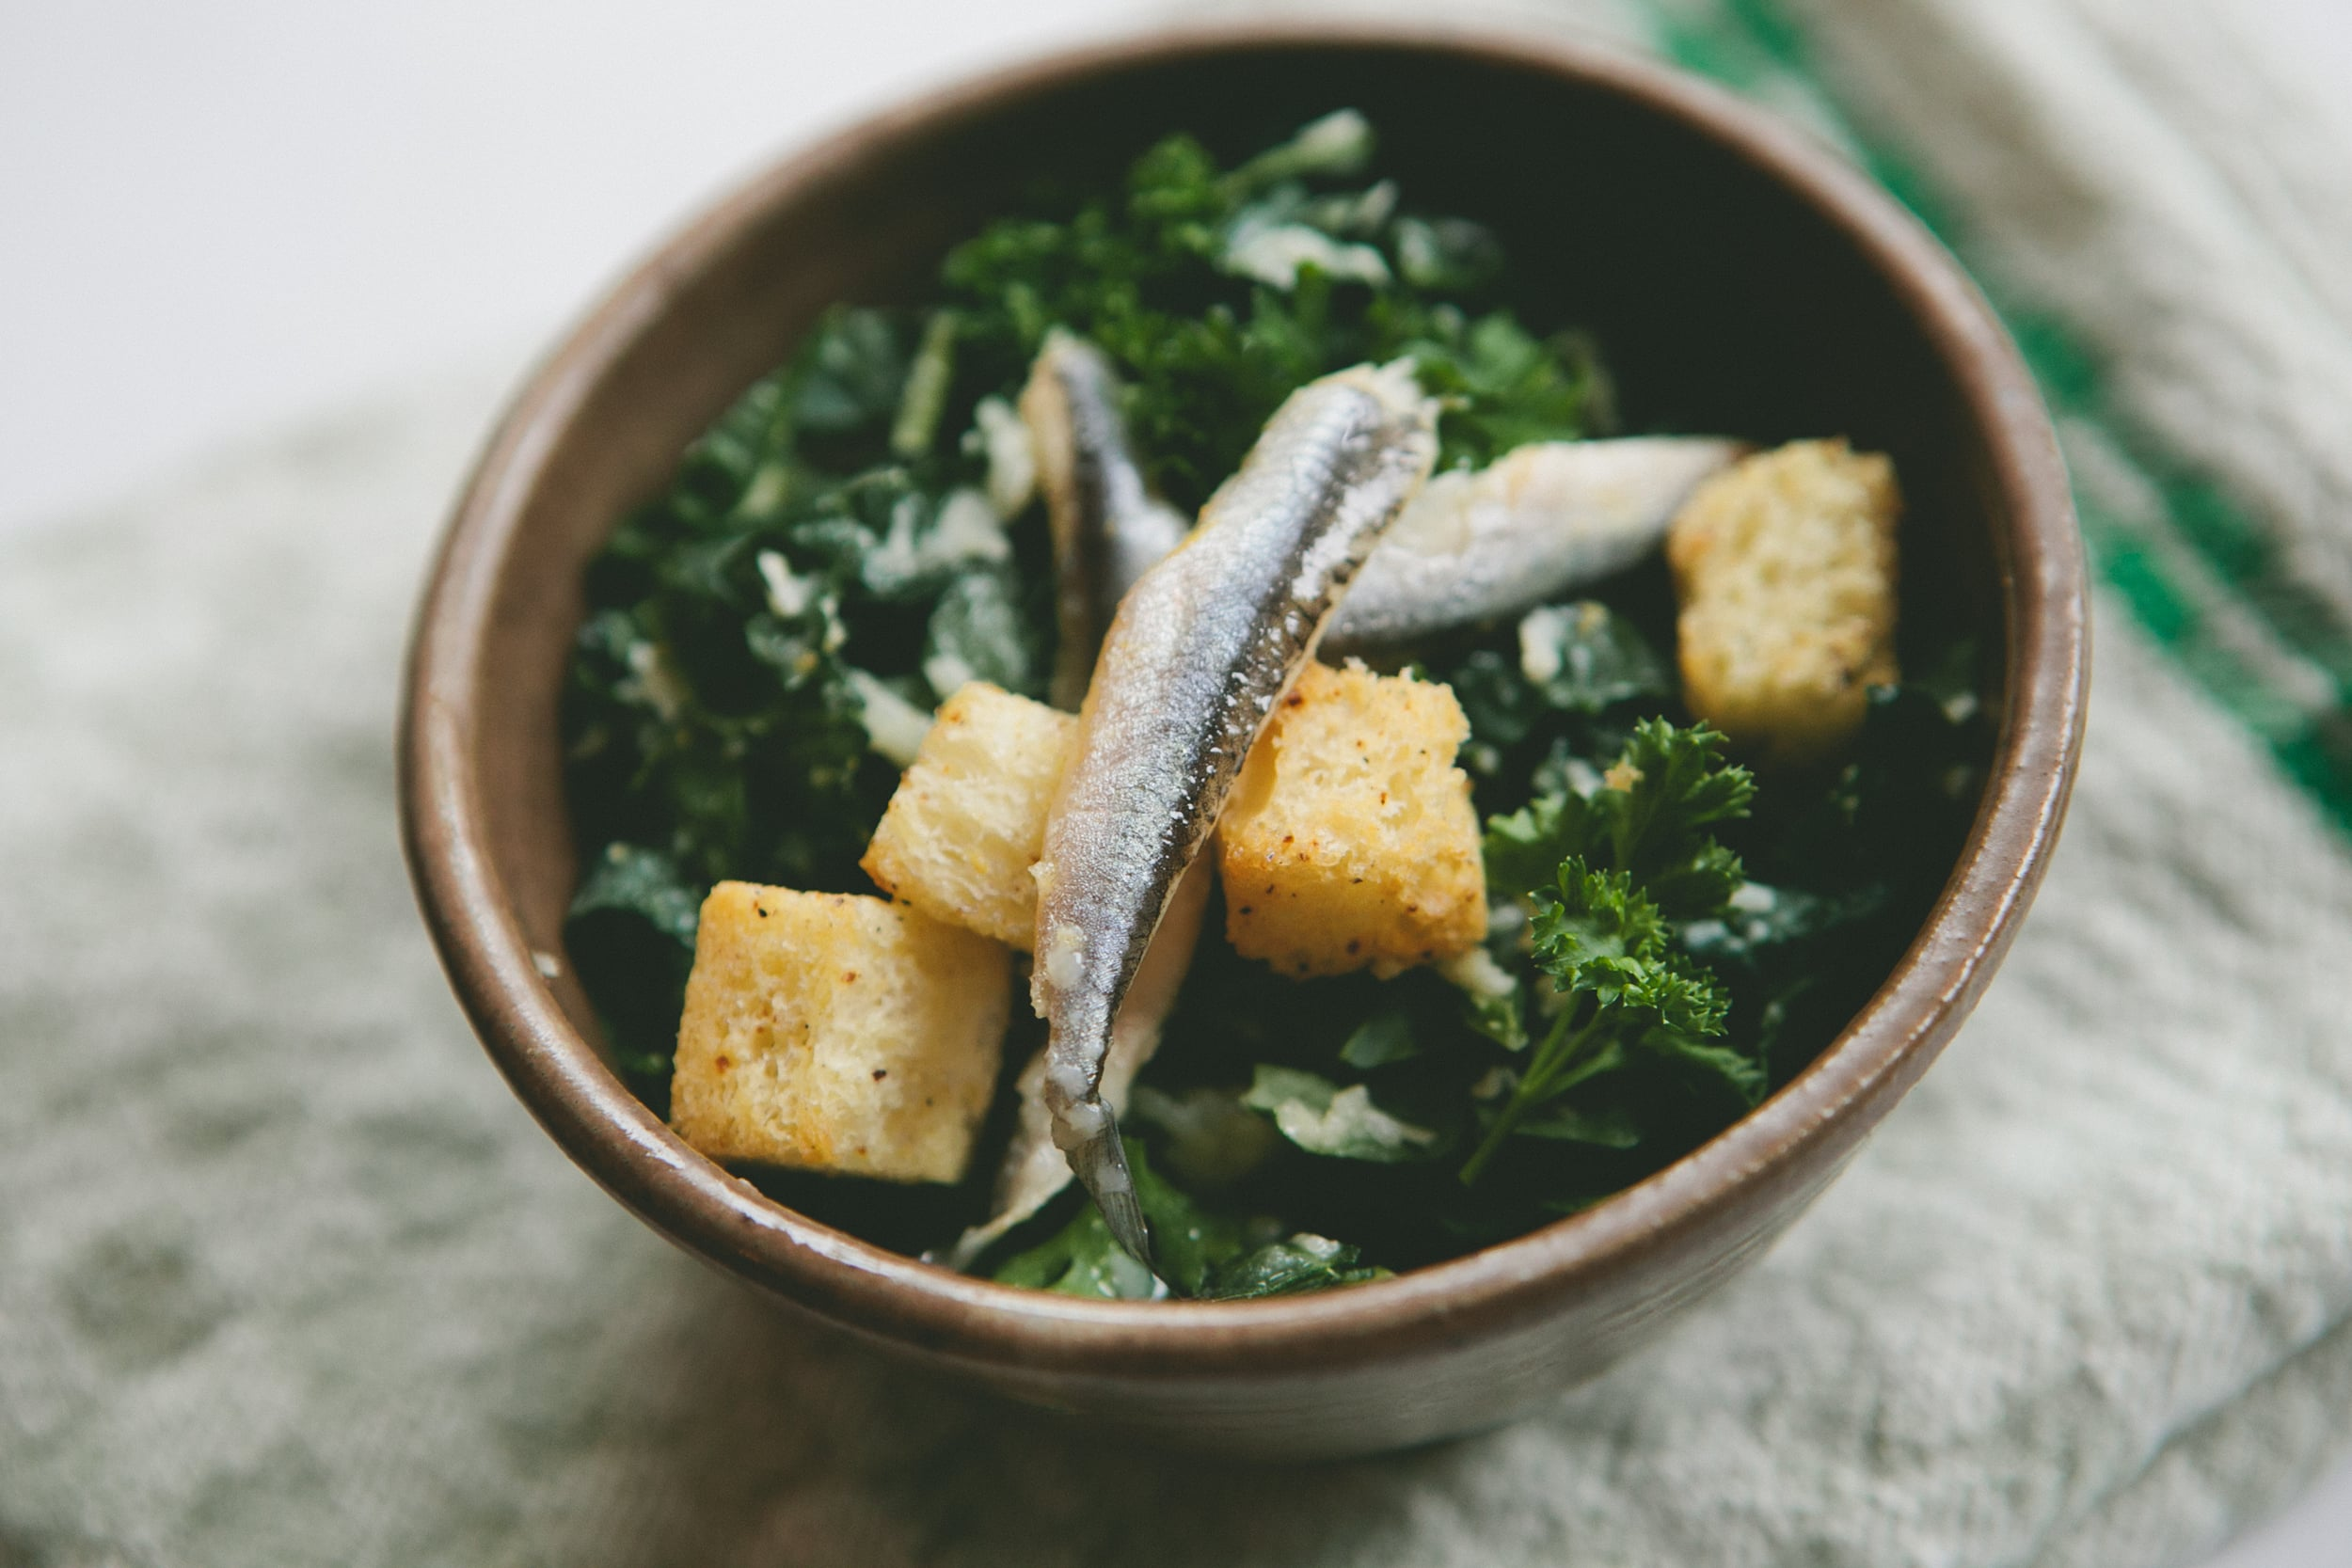 kale and parsley caesar. brioche, piment d'espelette